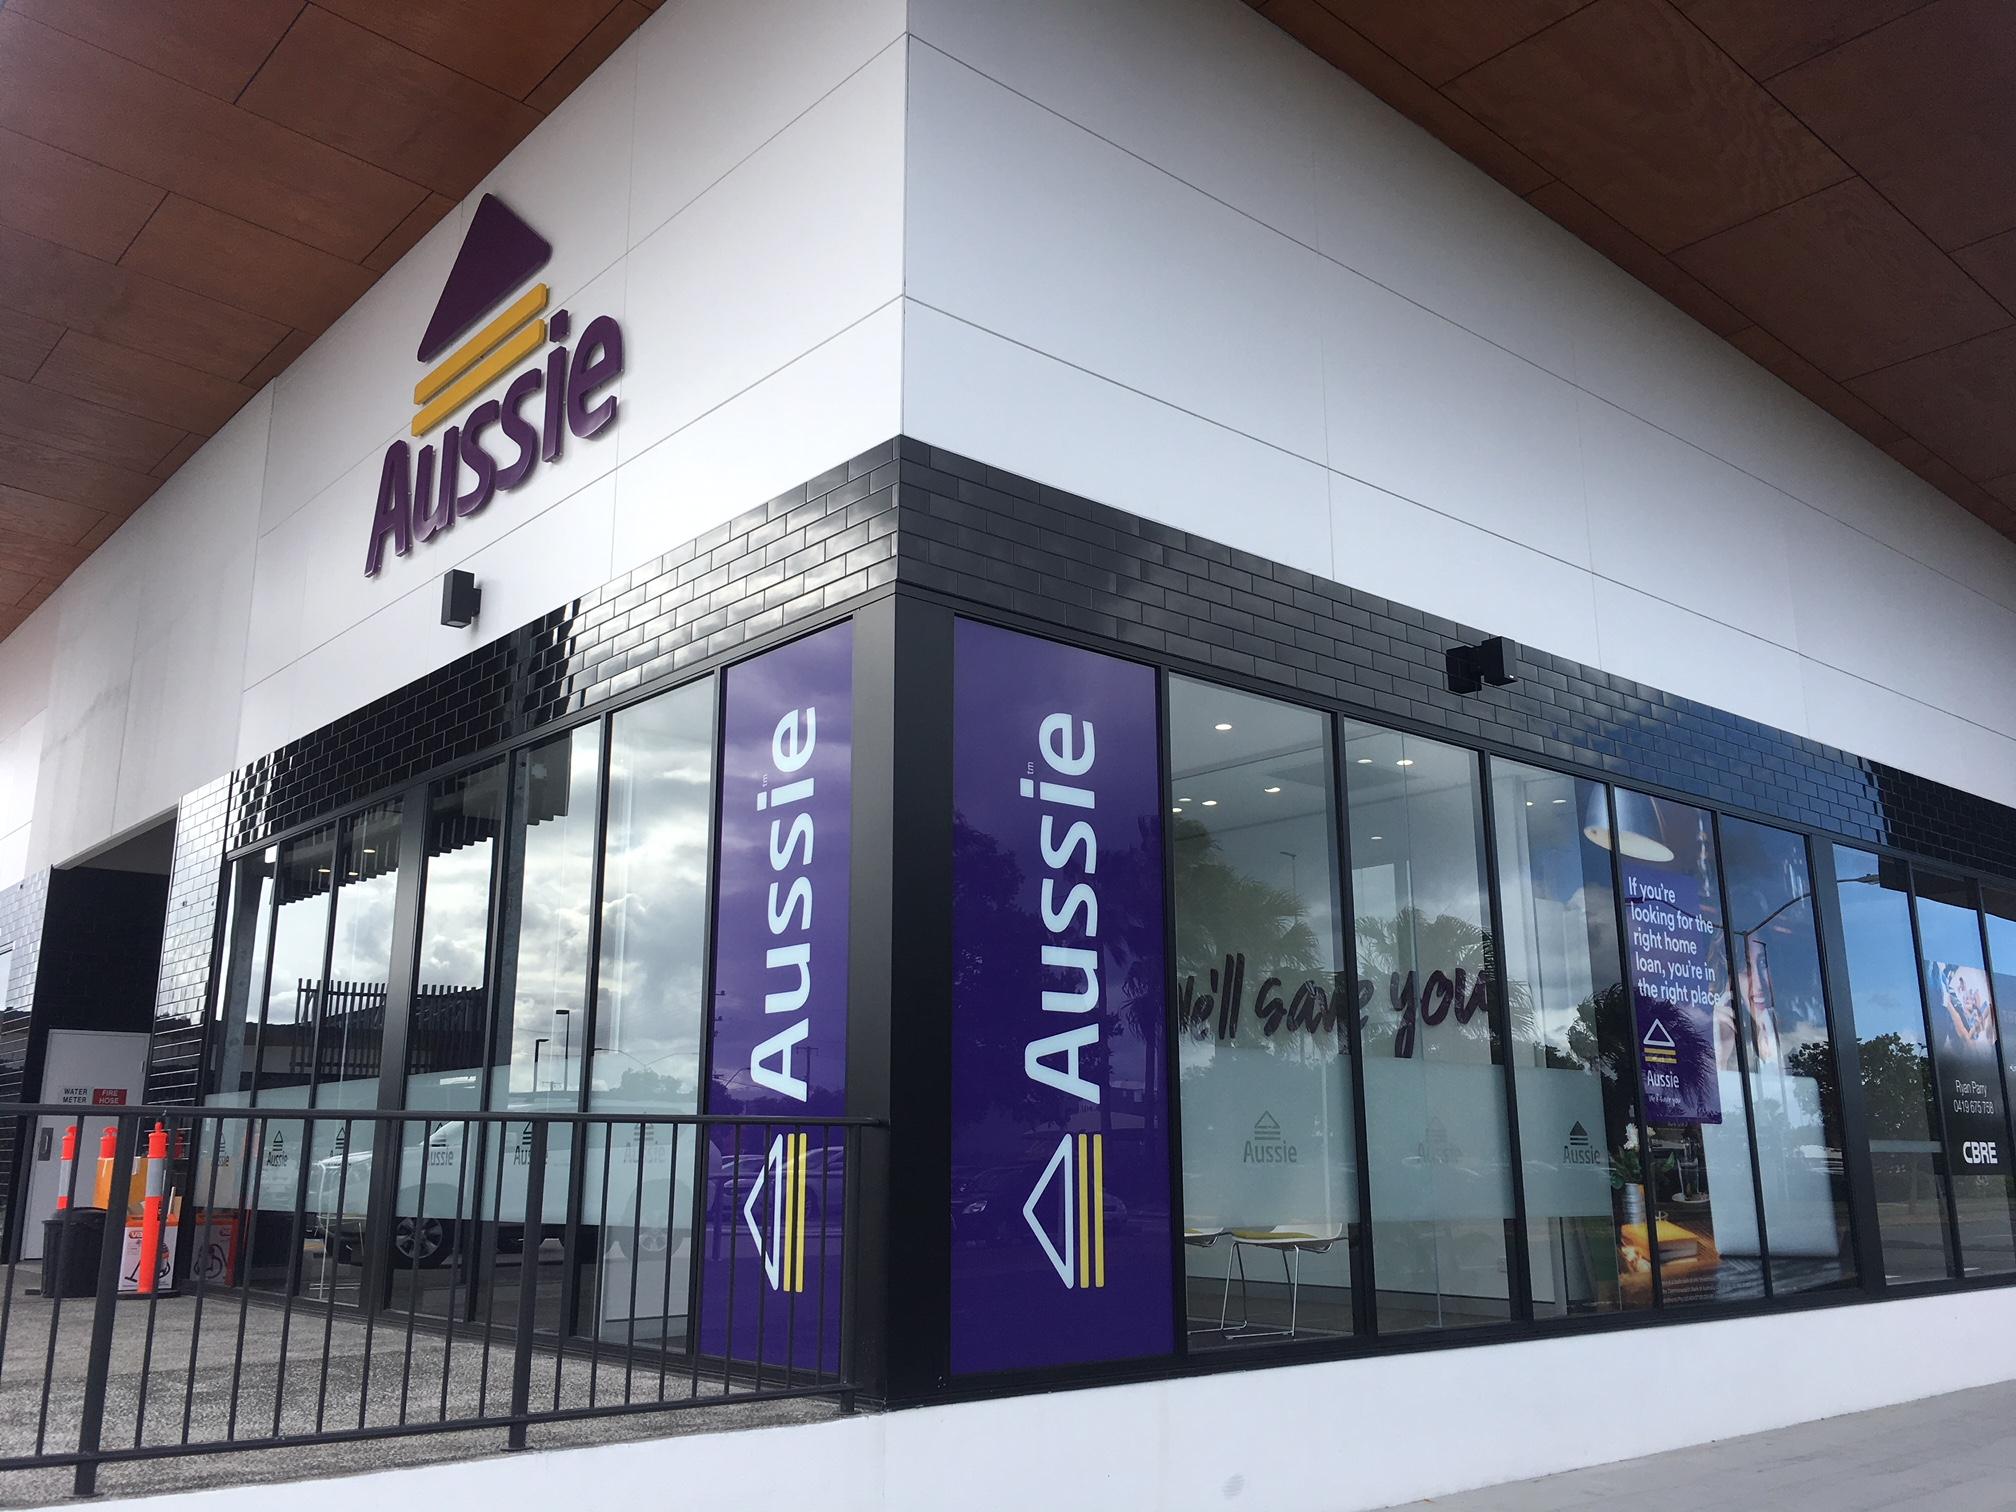 Gilles Plains retail franchise - #1 Mortgage Broker brand*